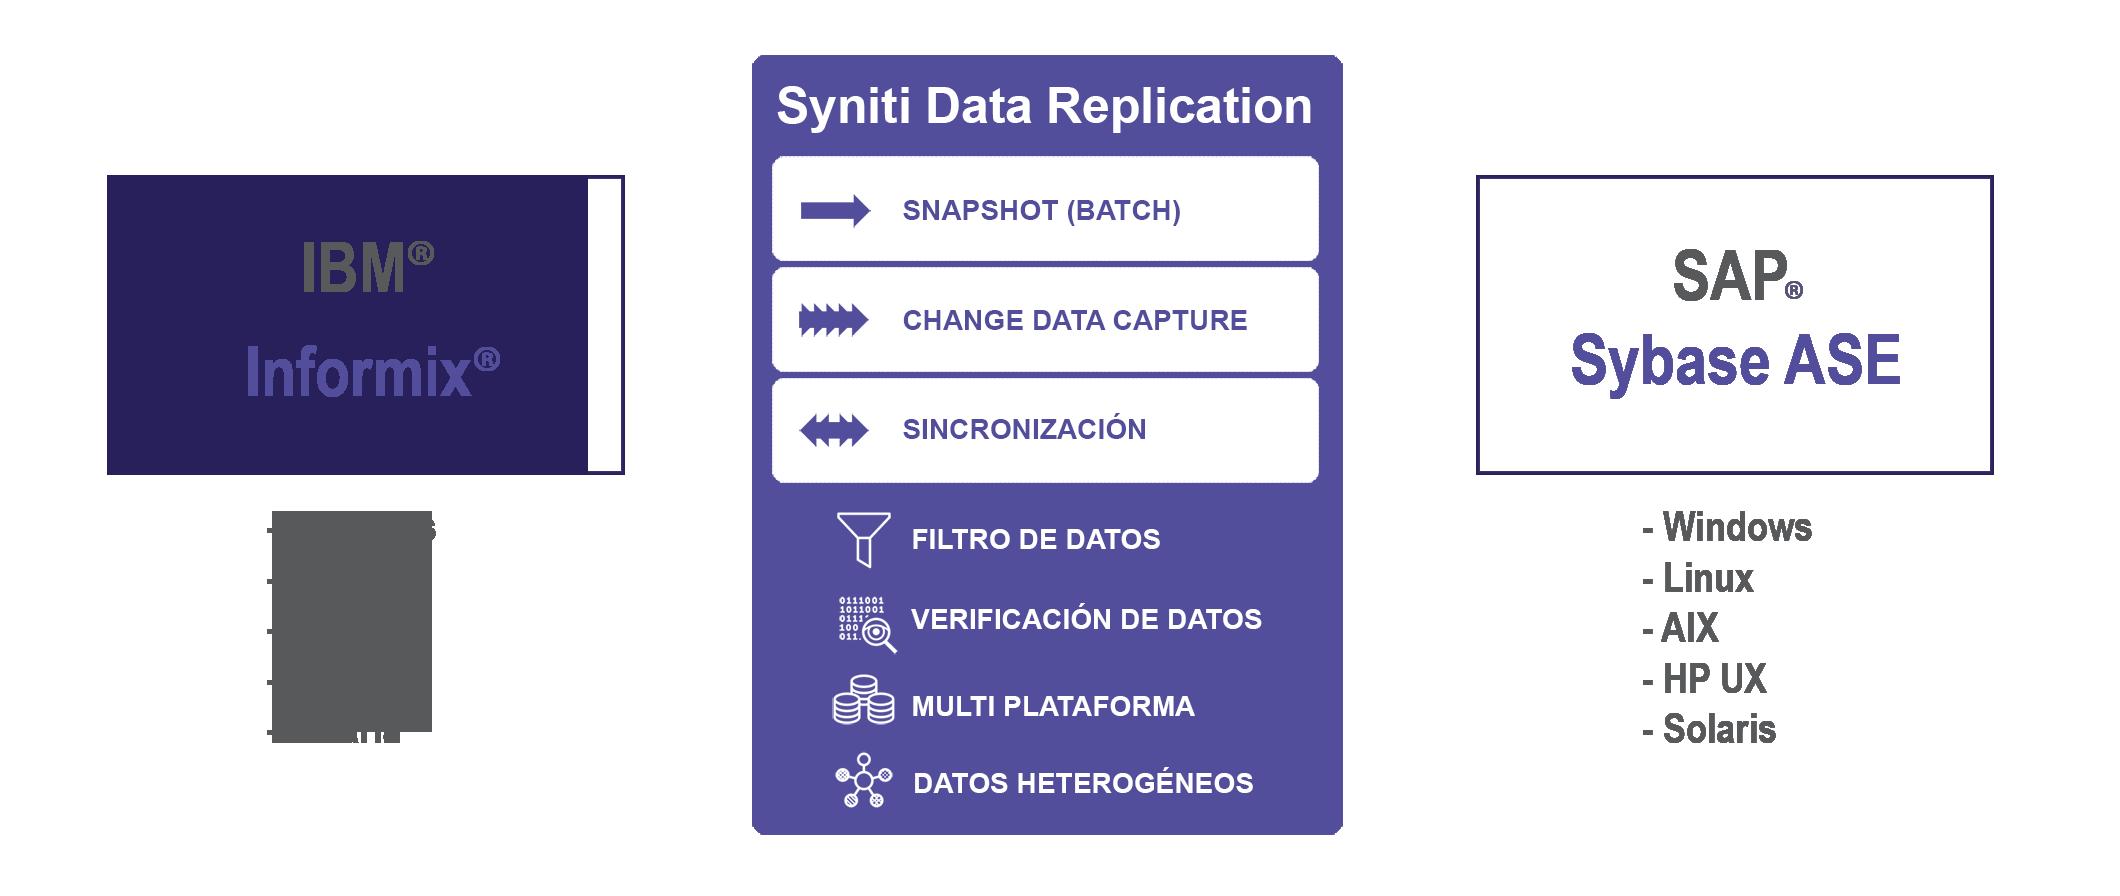 Replicación de datos Informix a SAP ASE en tiempo real